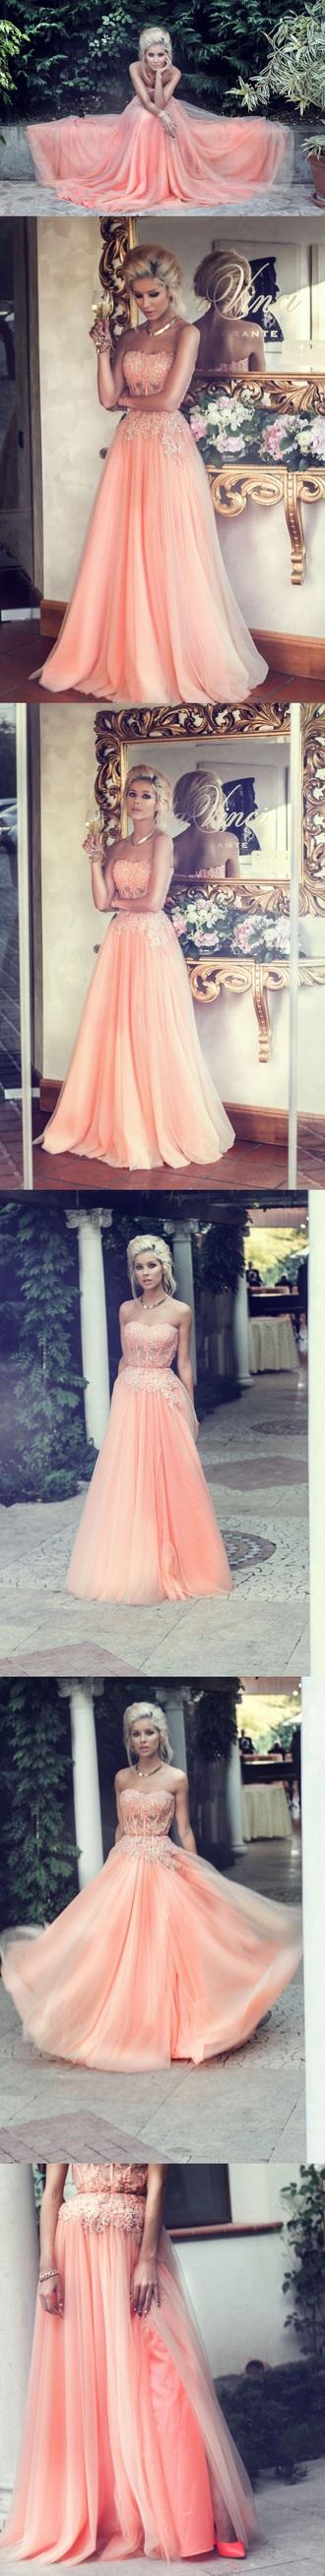 dress prom strapless strapless dress formal formal dress prom dress